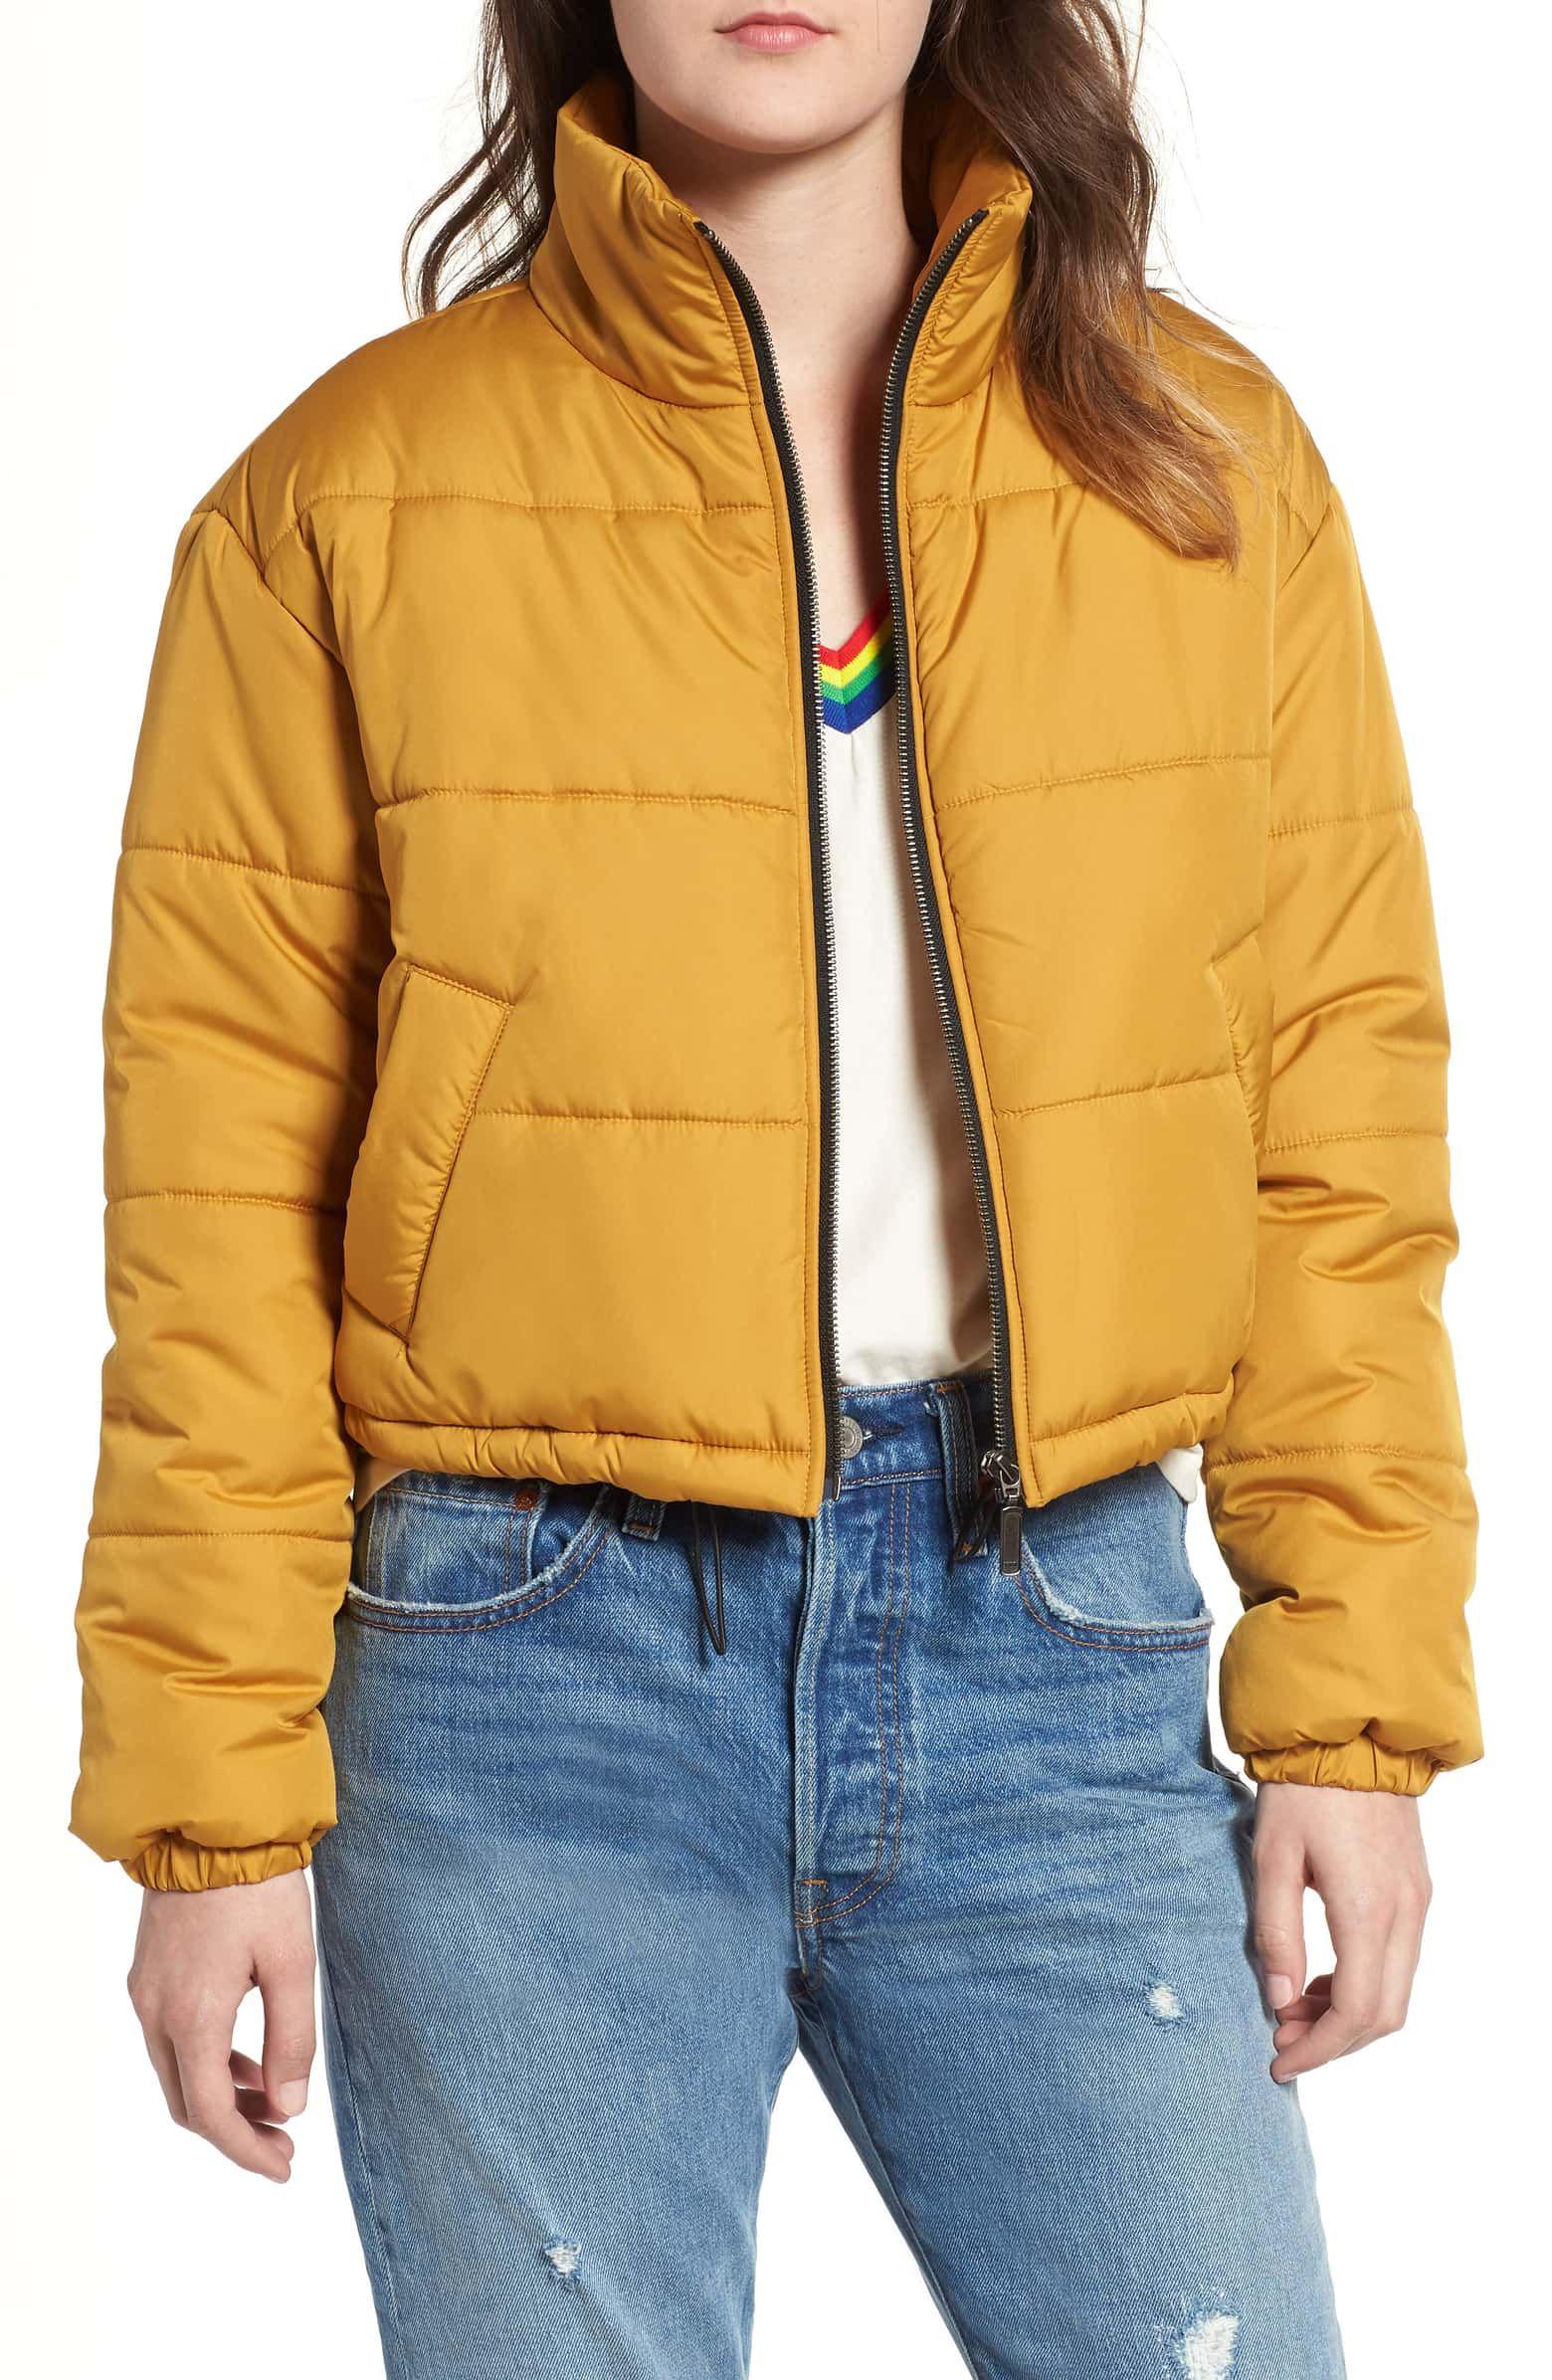 Bp Crop Puffer Jacket Regular Plus Size Nordstrom Yellow Puffer Jacket Stylish Winter Coats Jackets [ 2392 x 1560 Pixel ]